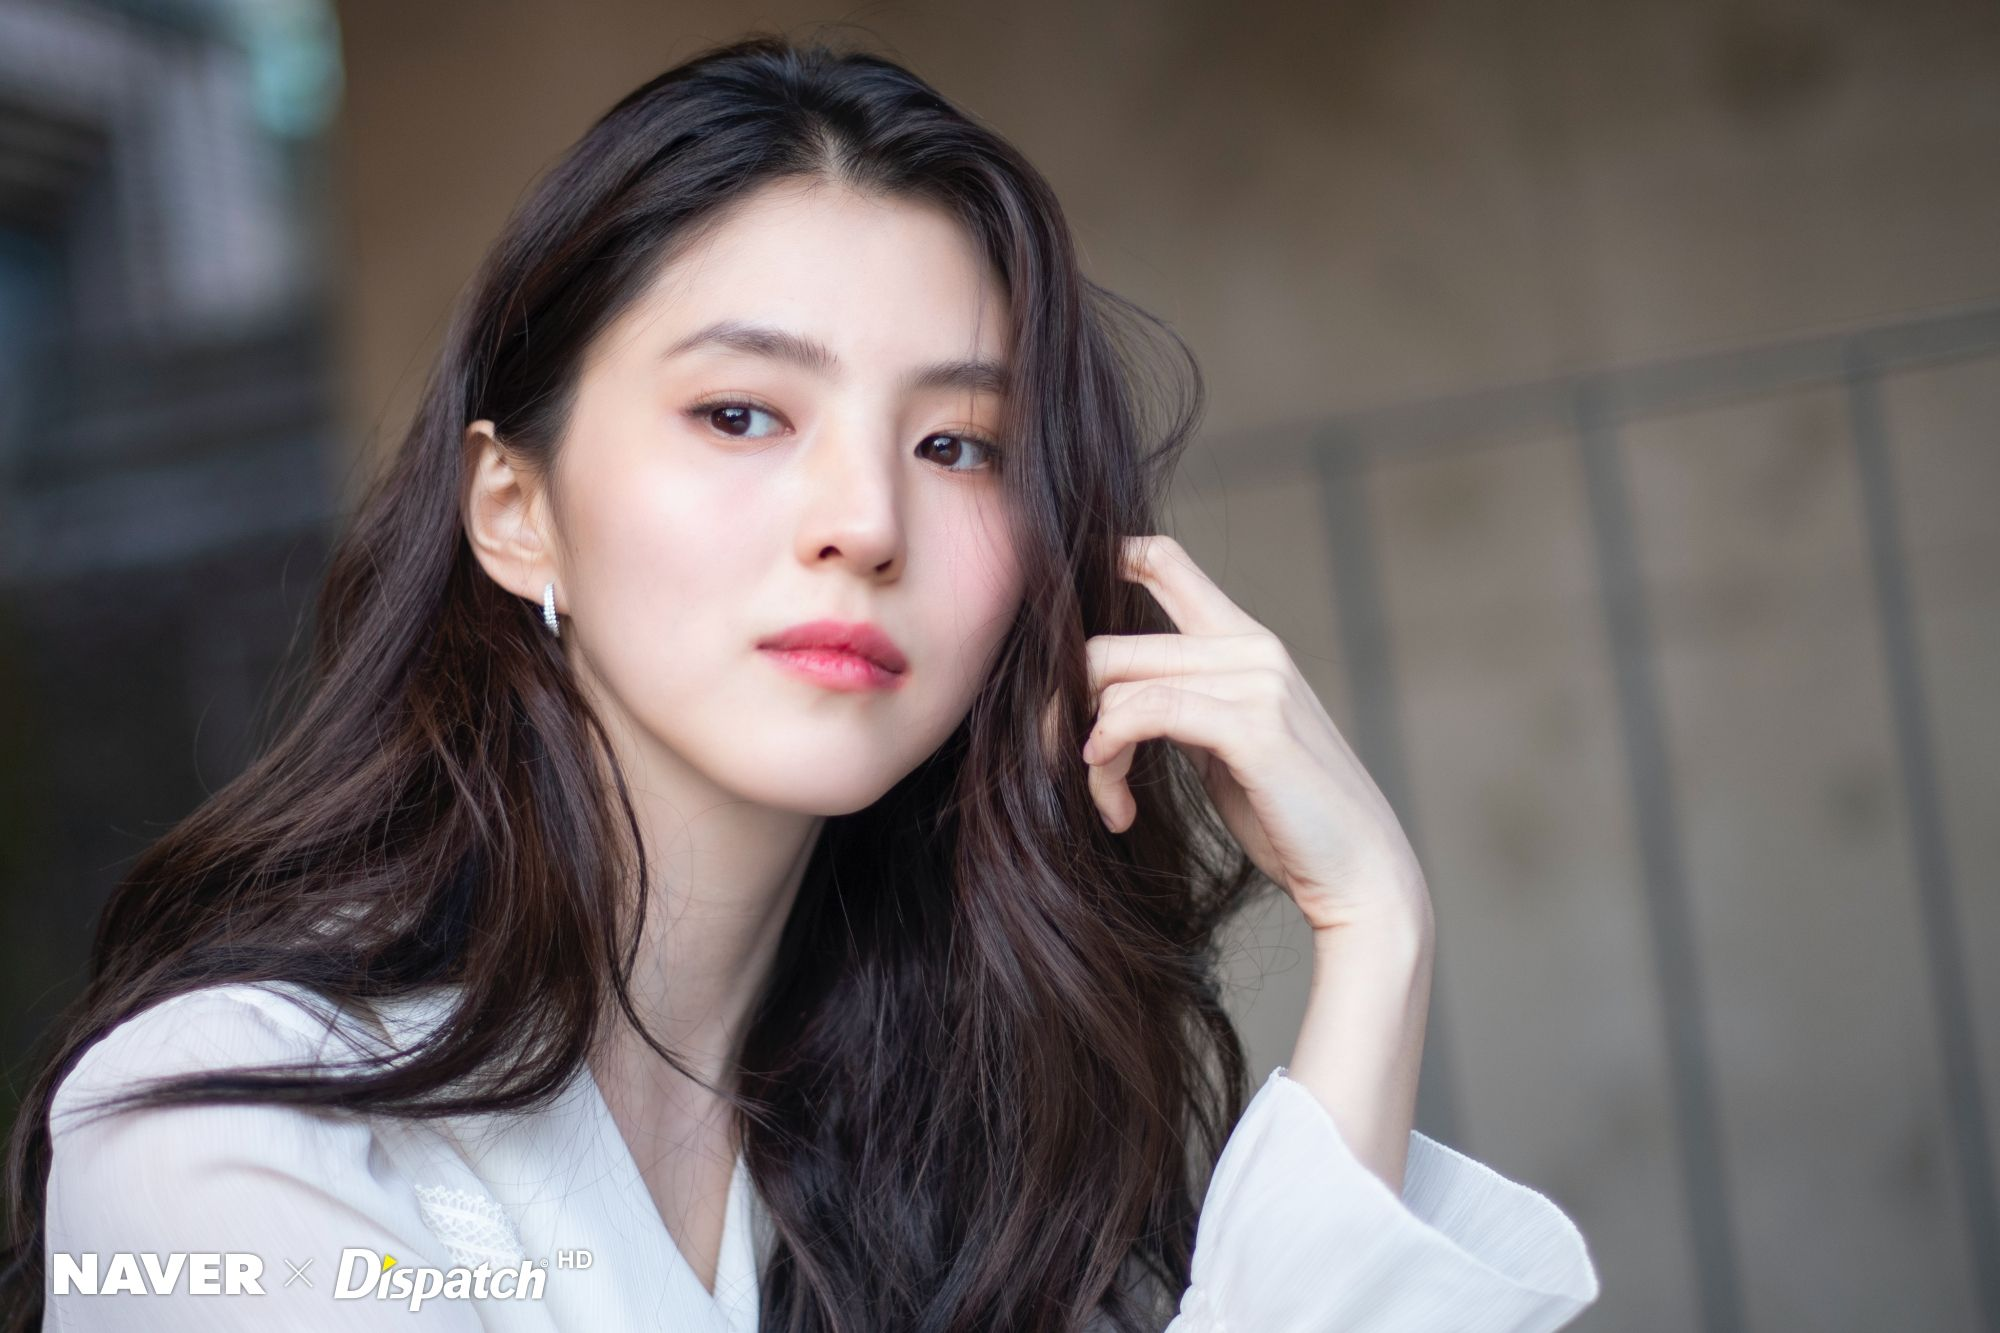 Han So Hee 2020 | Wanita cantik, Aktris, Gadis ulzzang